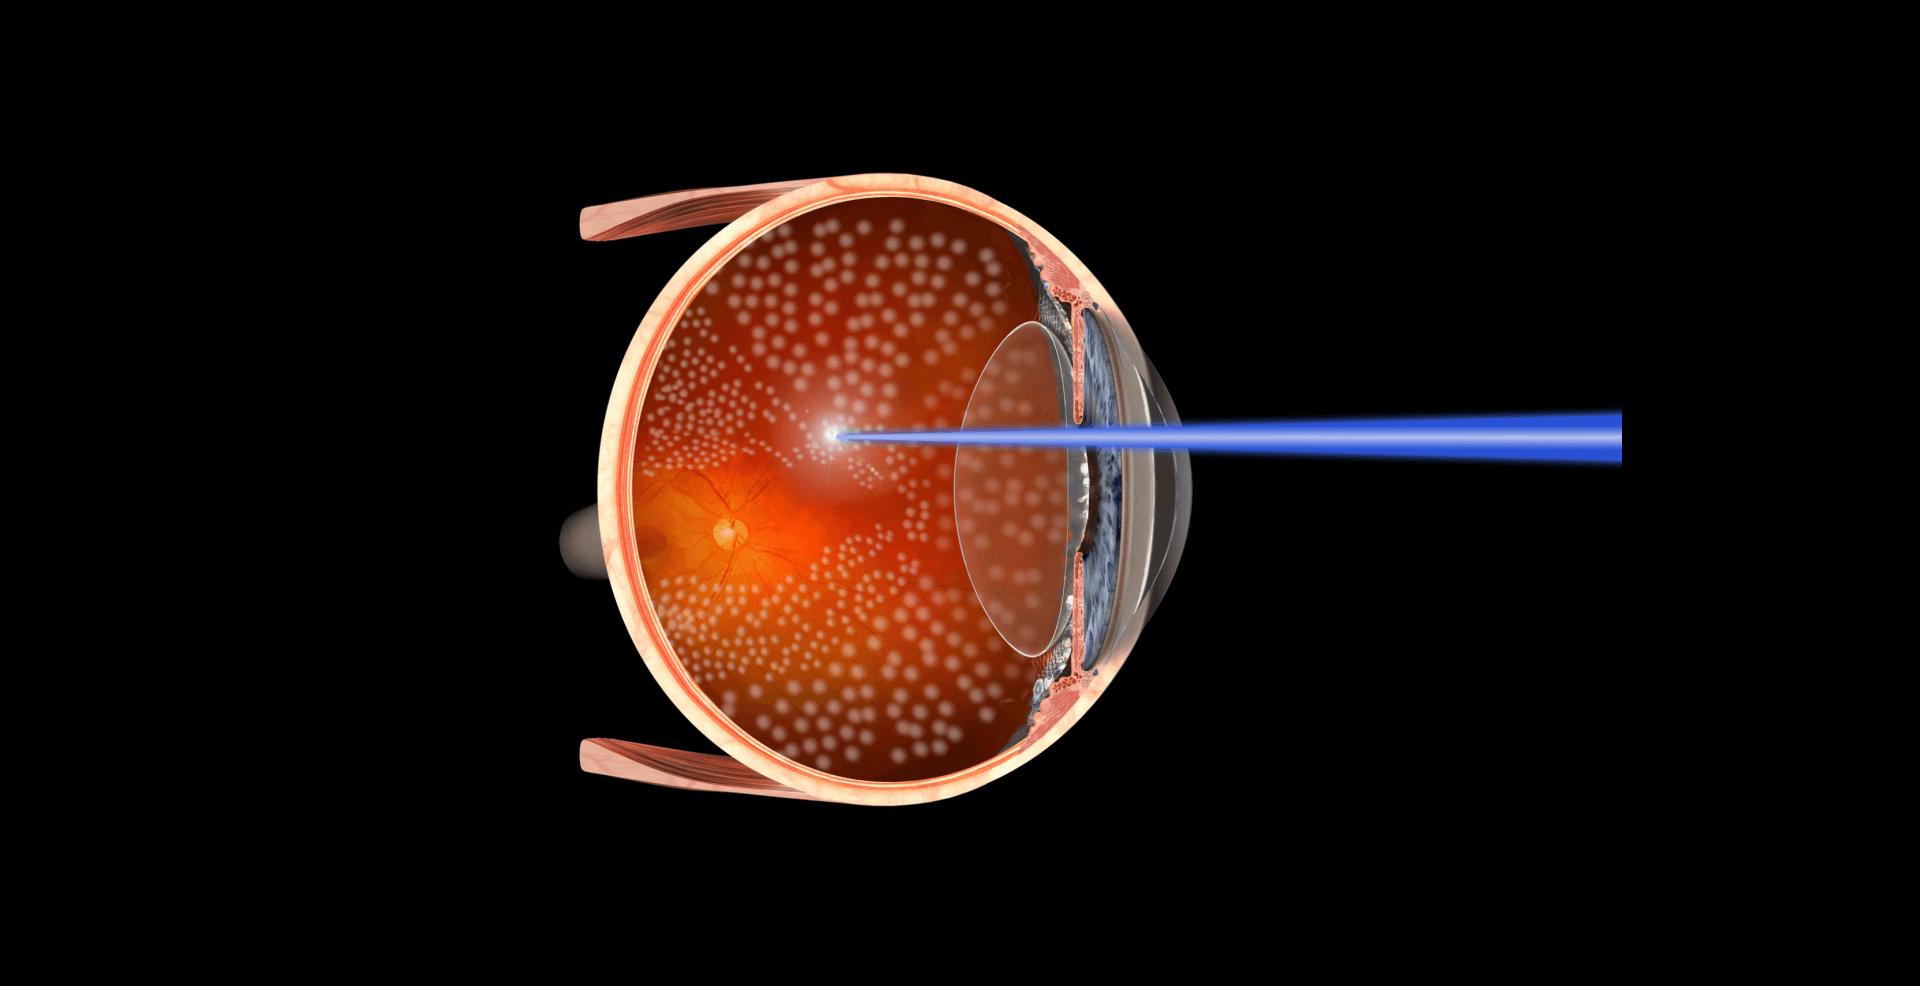 Pathologies High Country Macula, Retina, and Vitreous Laser photocoagulation post op